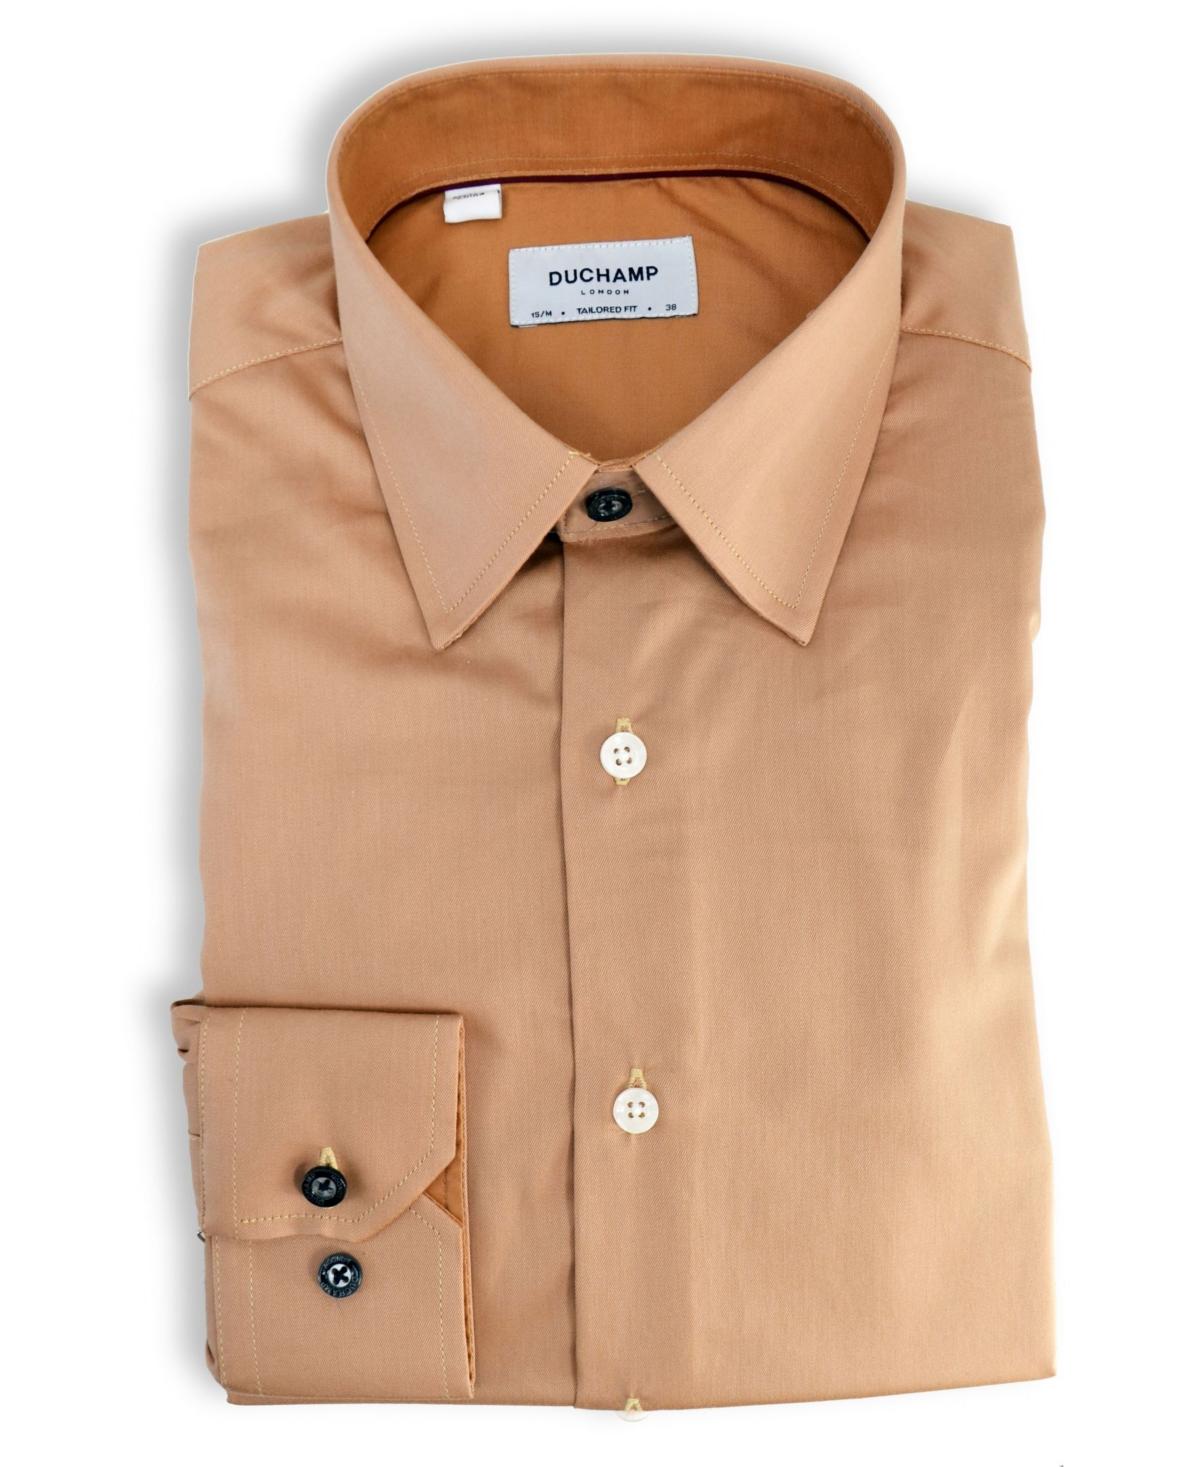 Duchamp London Solid Dress Shirt